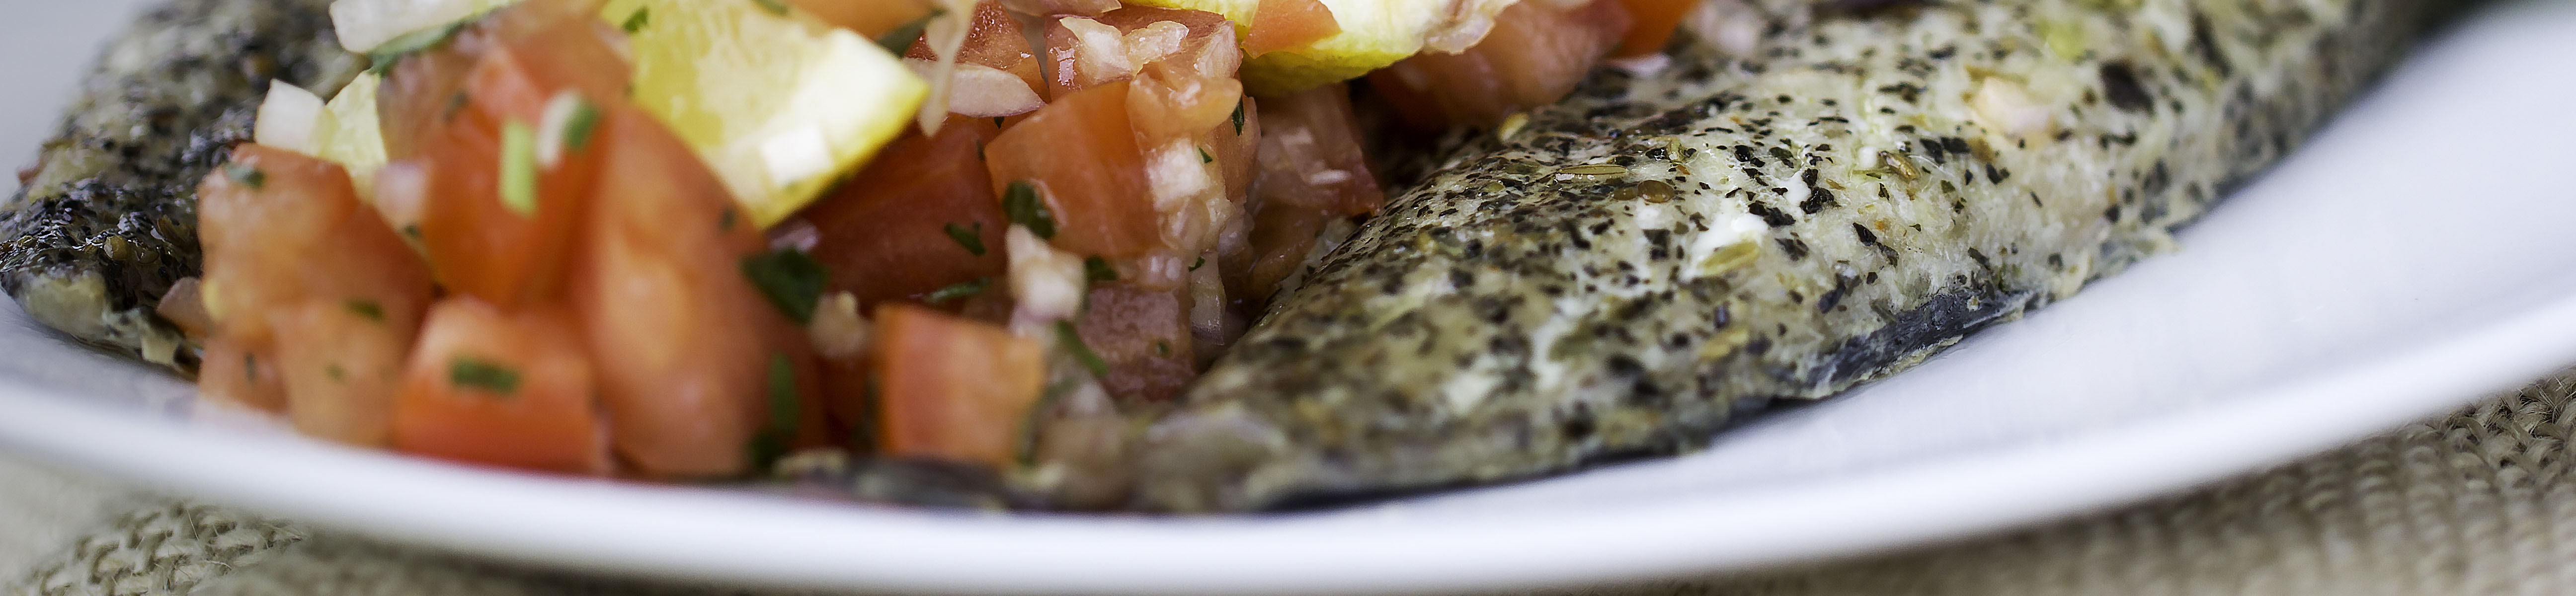 Bagt makrelfilet med tomatsalsa – Pico de Gallo.